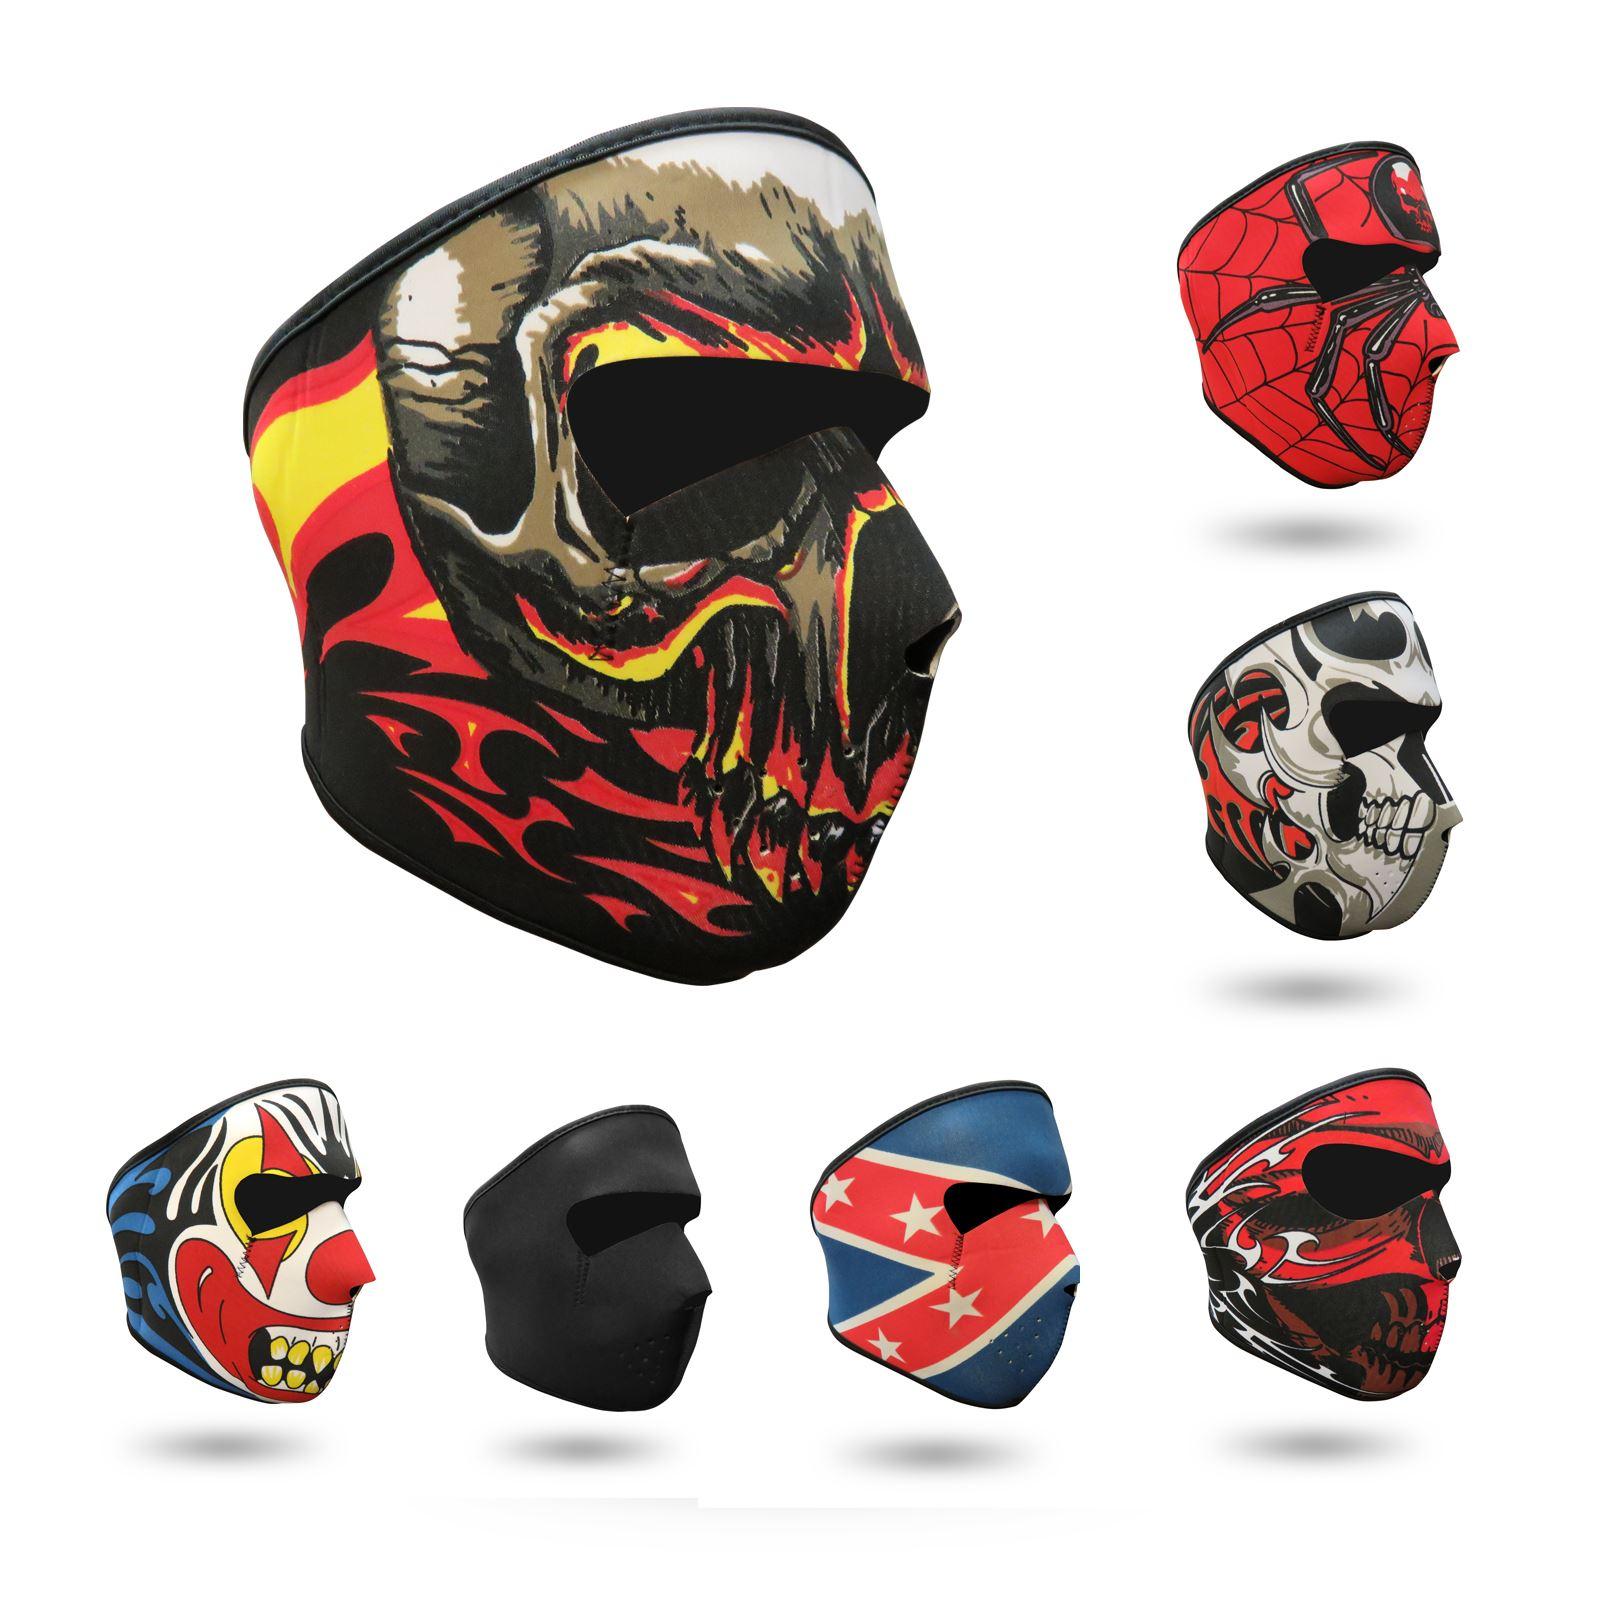 Néoprène Intégral Reversible Masque Moto Ski Snowboard Moto Ski Quad